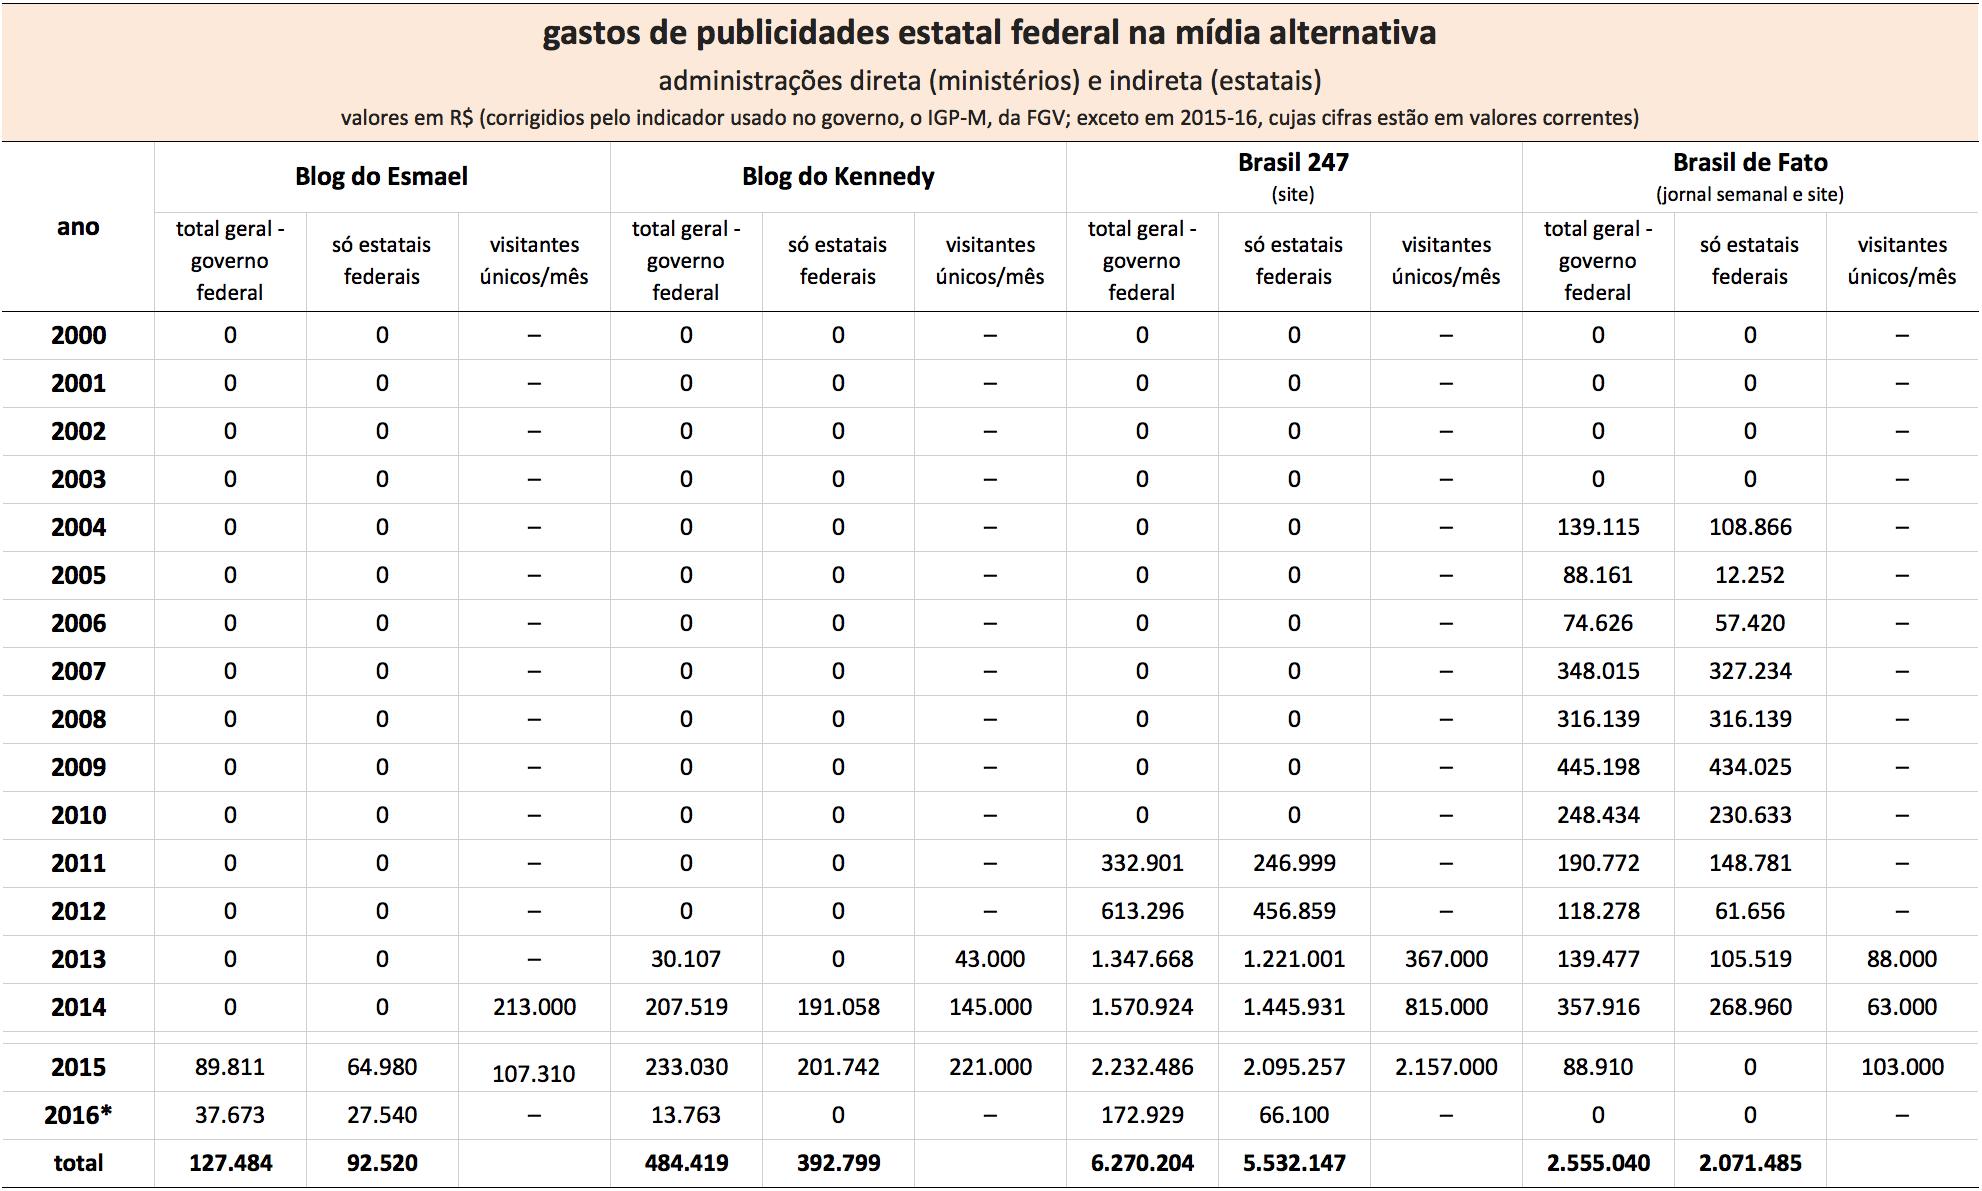 midia-alternativa-1